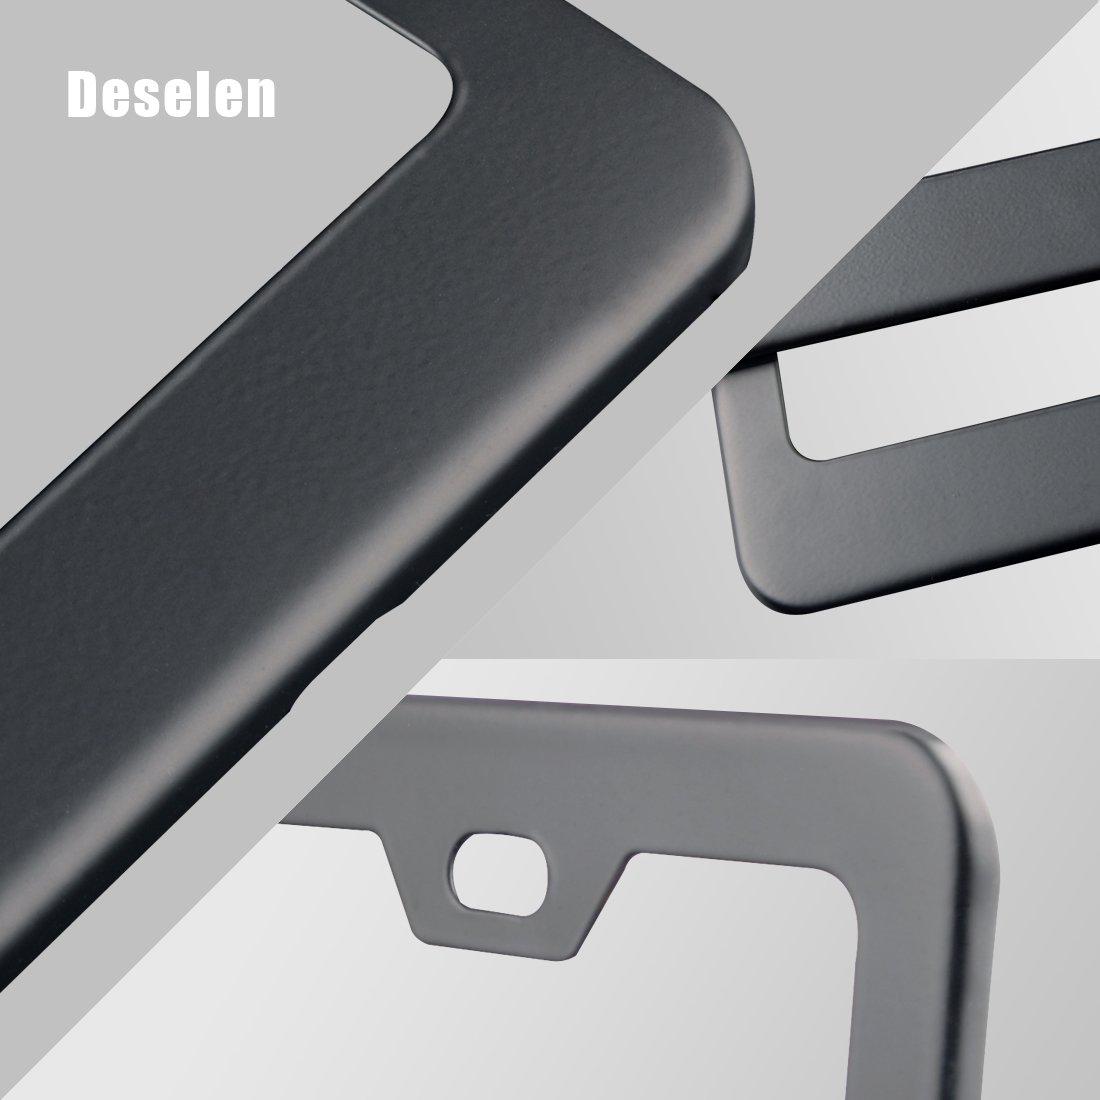 LP-BS17VS LIGHTUP LED Black Deselen Copper Tire Valve Stem Caps with Keychain Styling for Mercedes Benz AMG